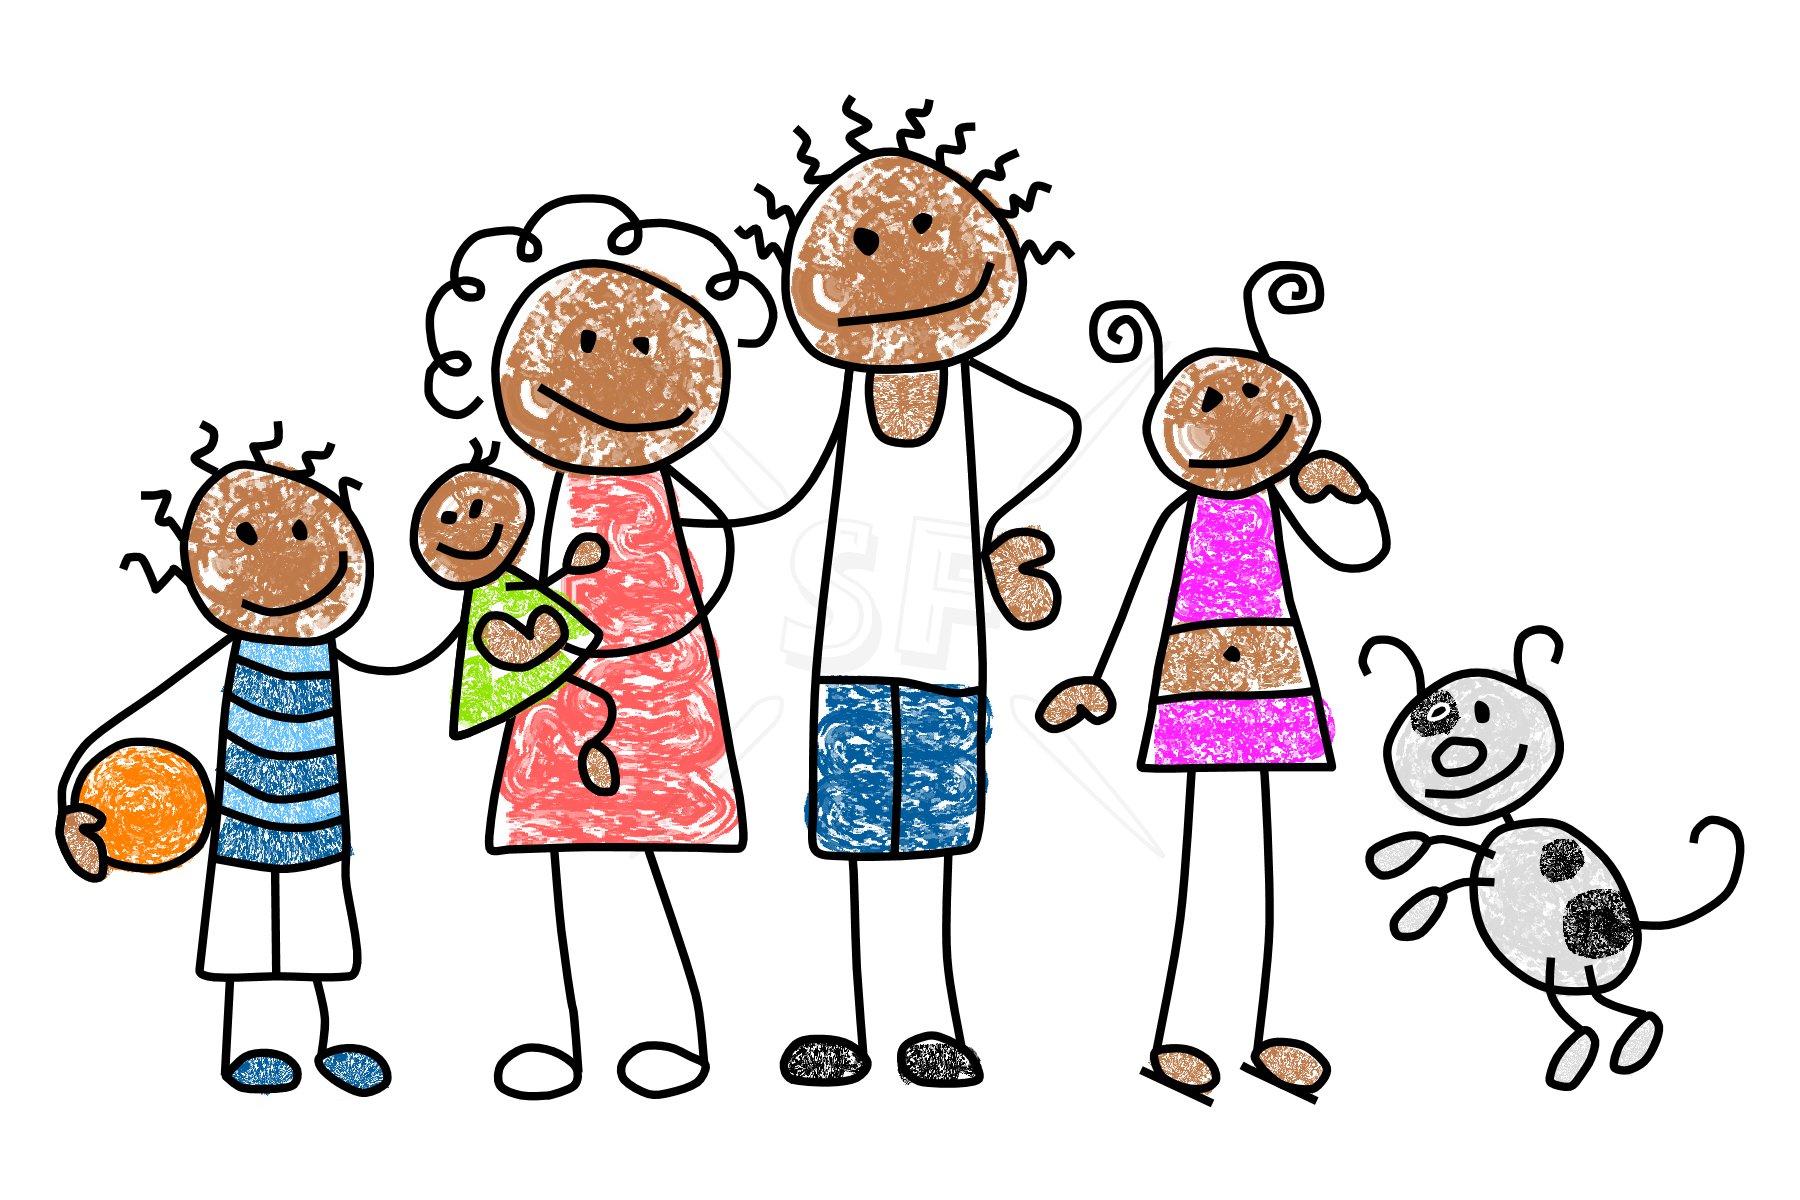 spoils-clipart-parenting-clipart-familyd1800x1200